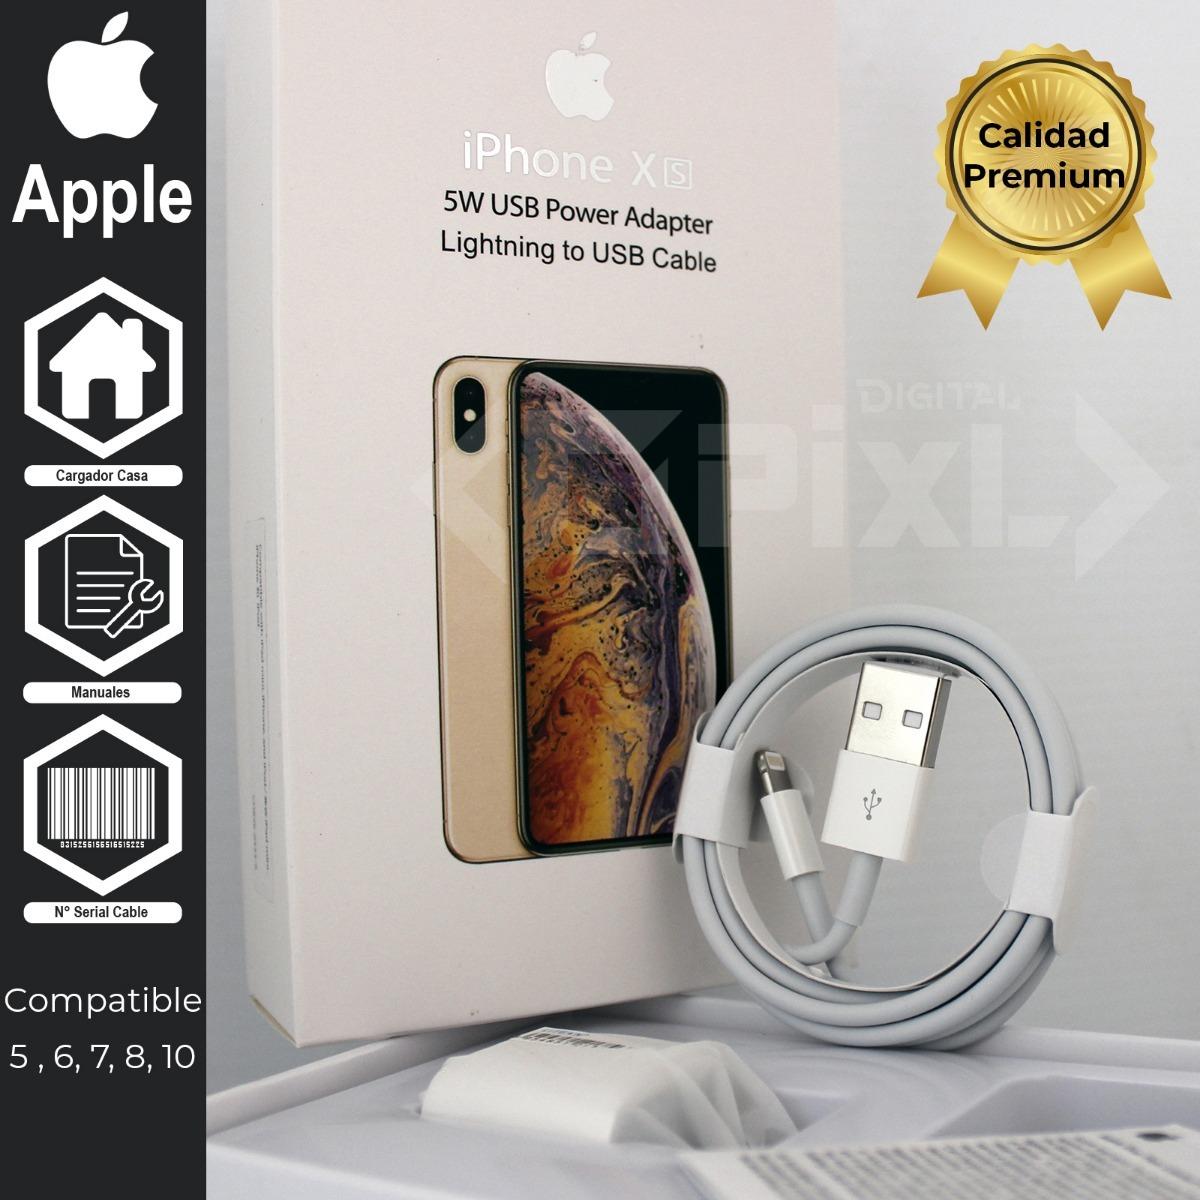 a4e8f30de33 Cargador Apple Original Lightning iPhone 5 6 7 8 10 - $ 388.00 en ...